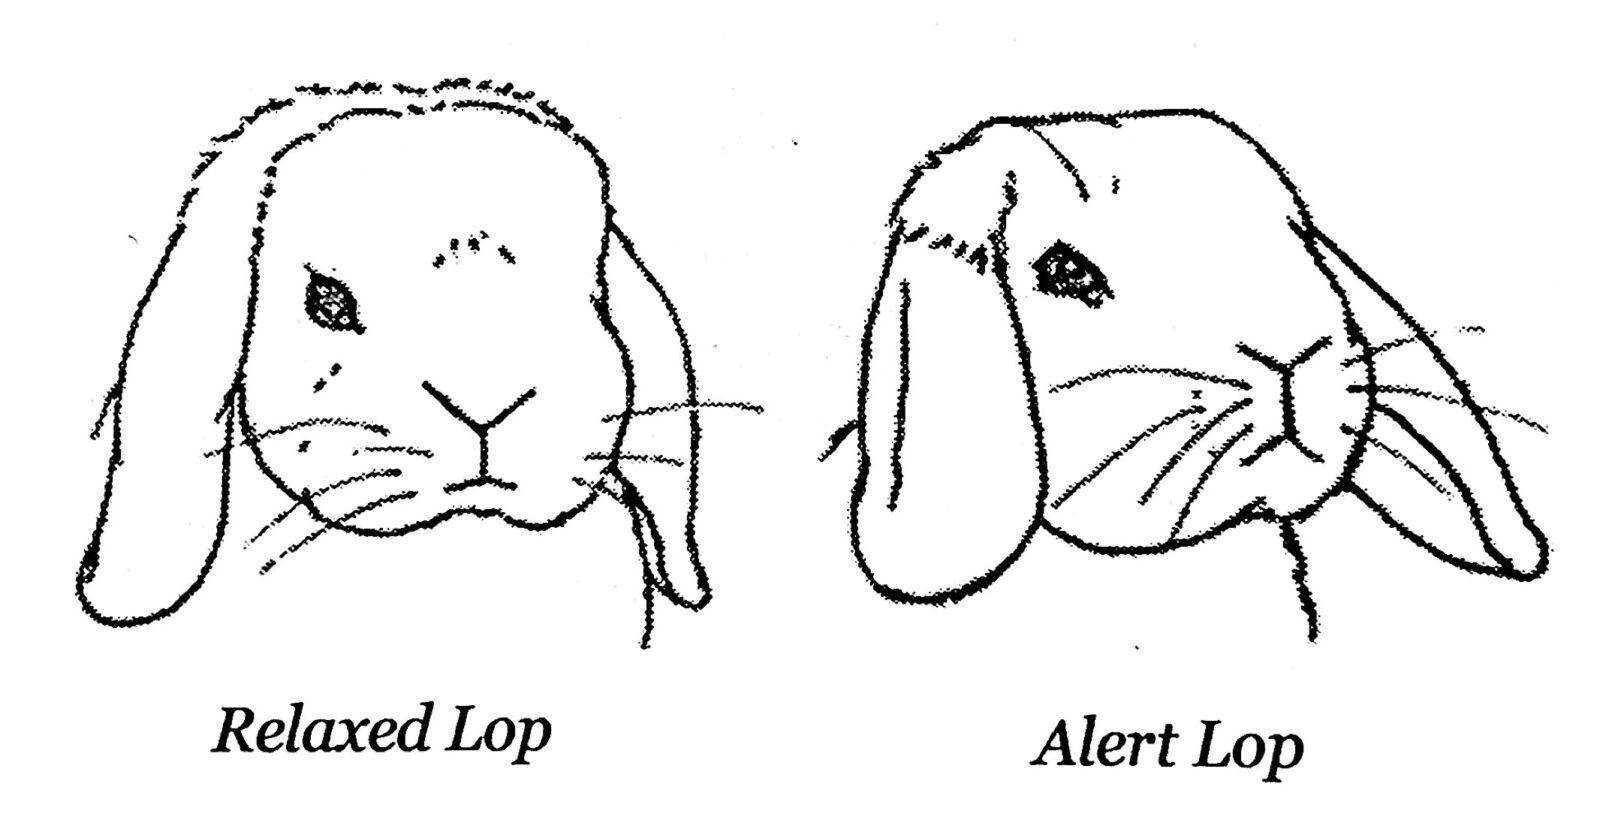 kanin kropssprog